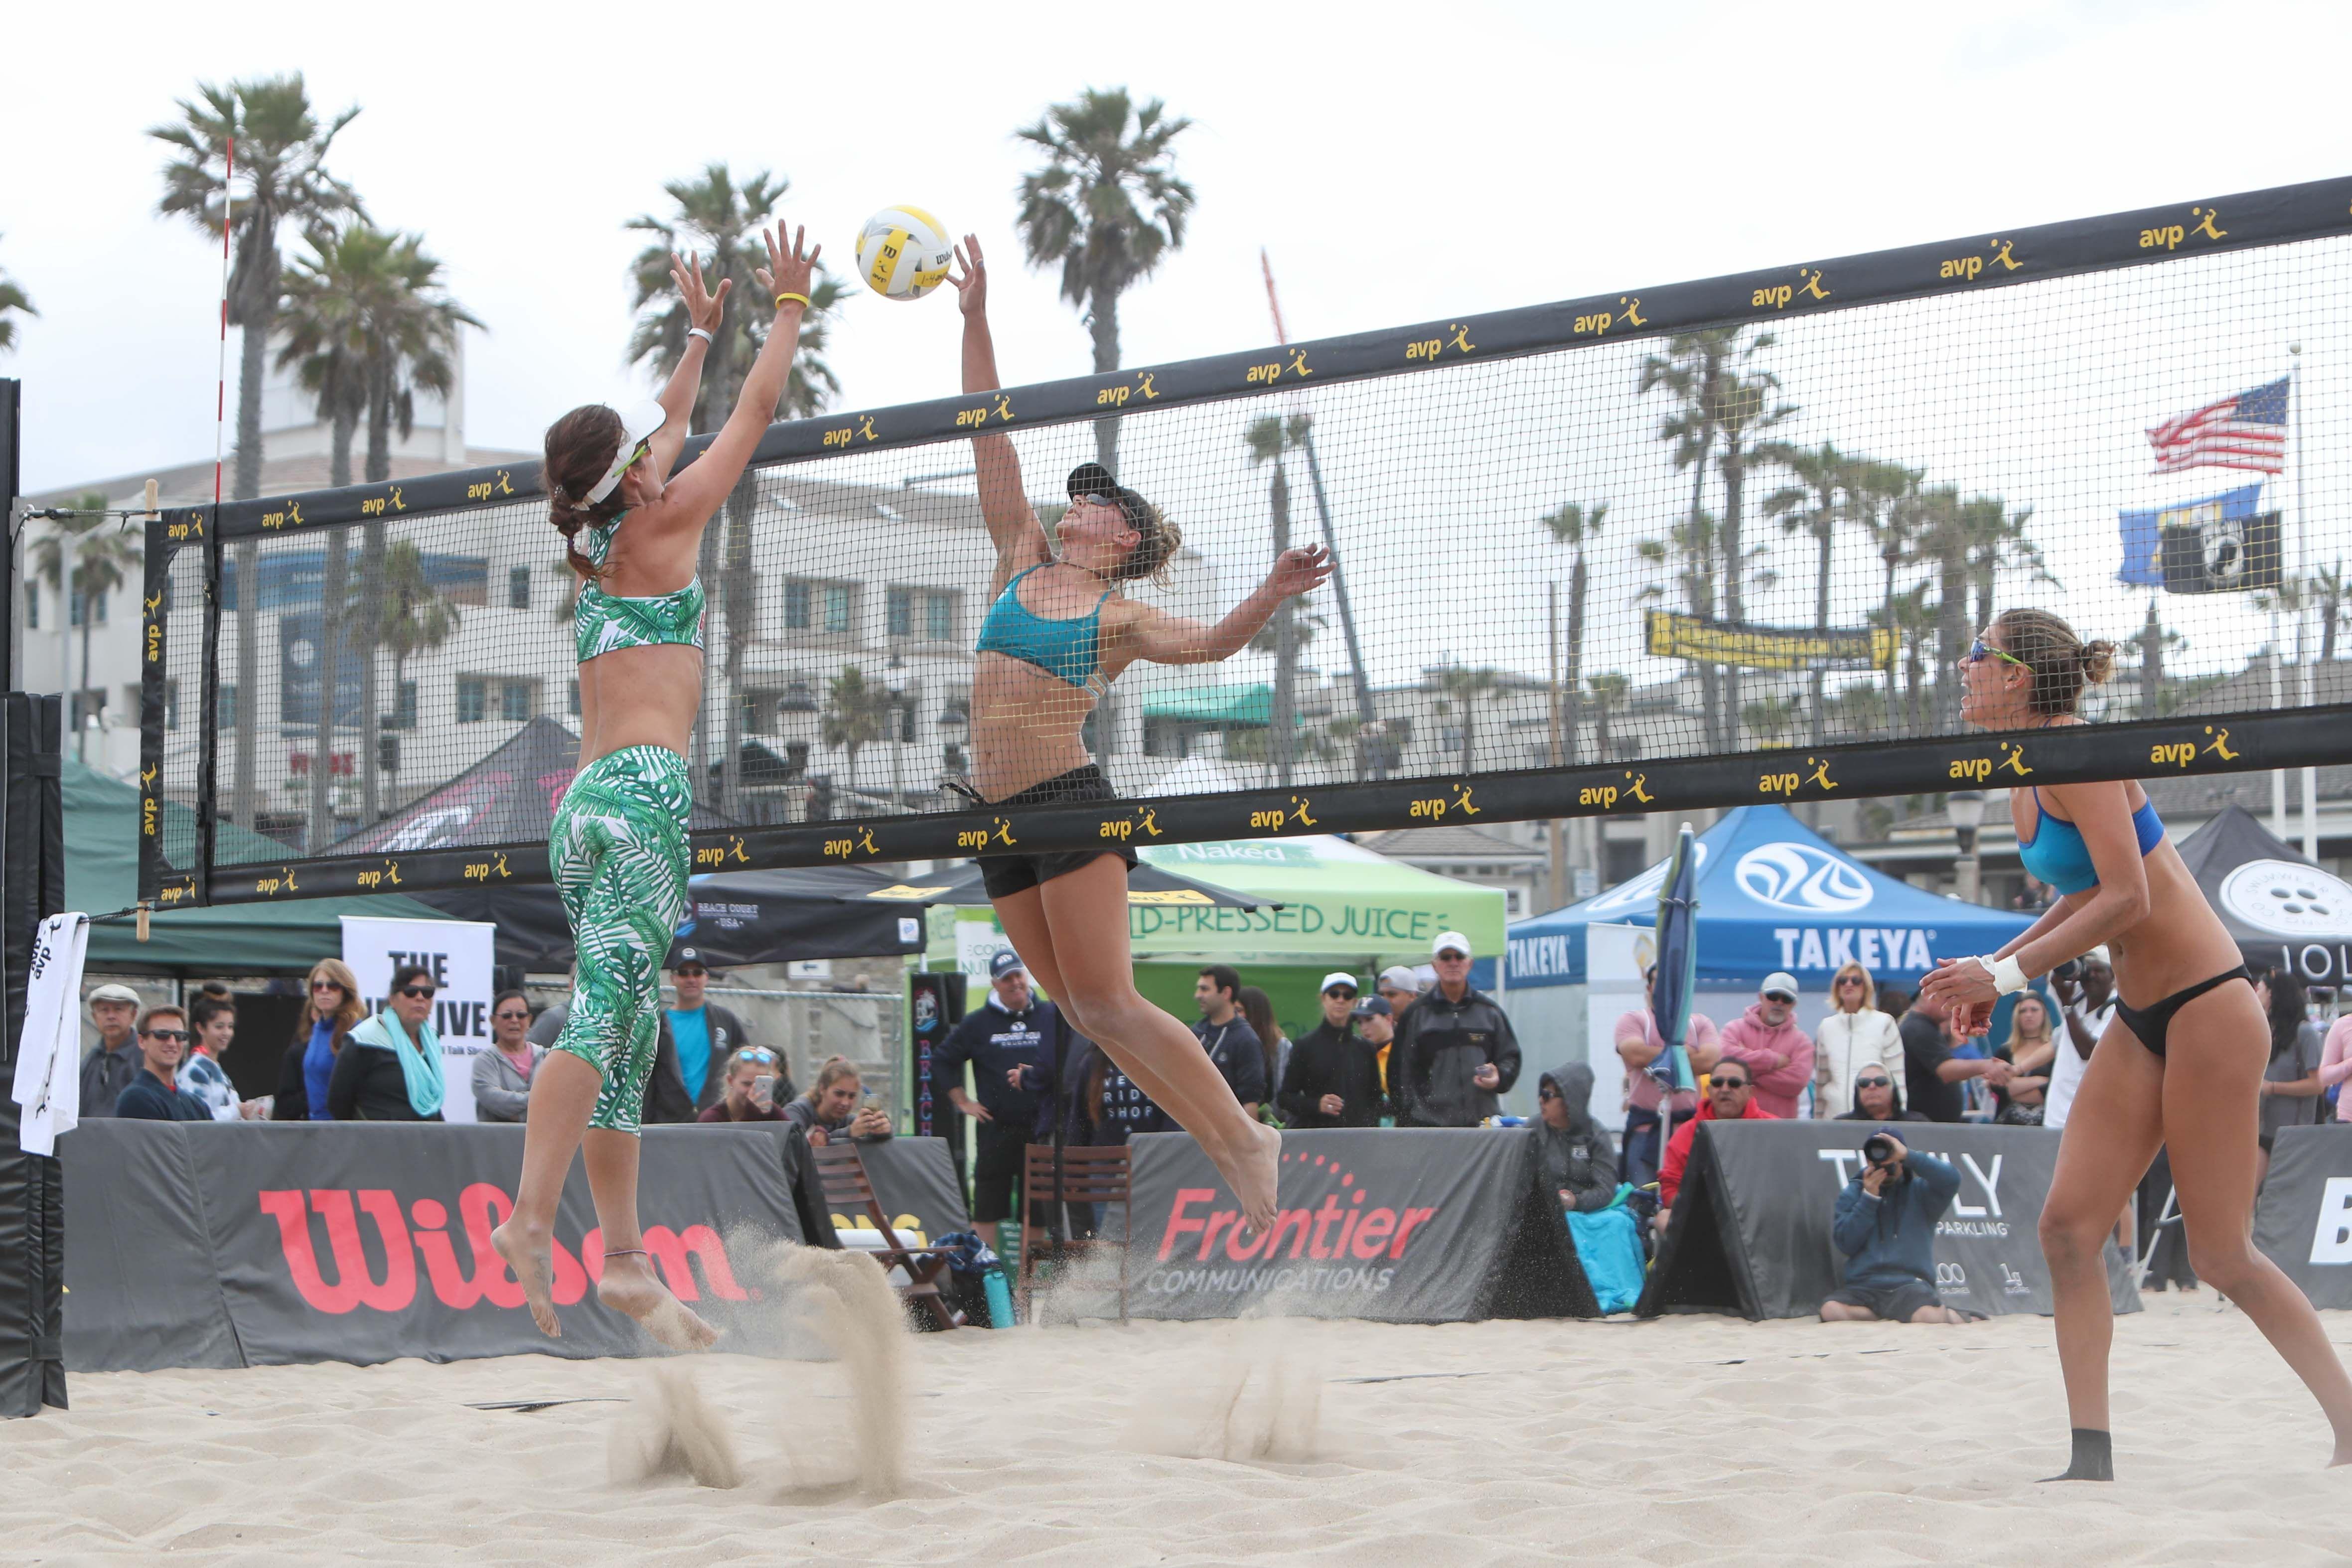 Avp Huntington Beach Open 2017 Photo Gallery Avp Beach Volleyball Beach Volleyball Huntington Beach 2017 Photos